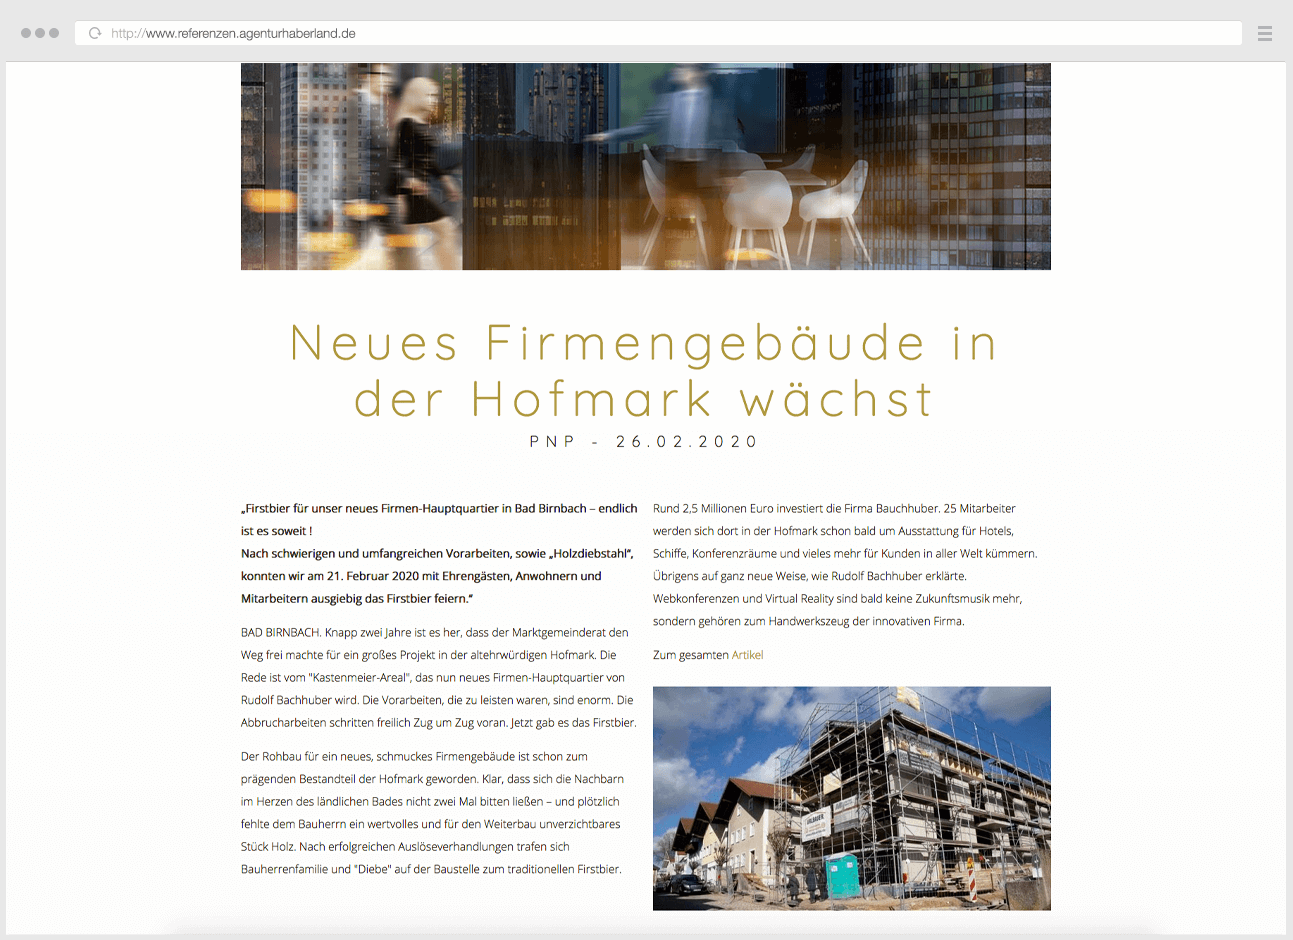 Webdesign Eggenfelden - Haberland - Portfolio Bachhuber - Newsbereich